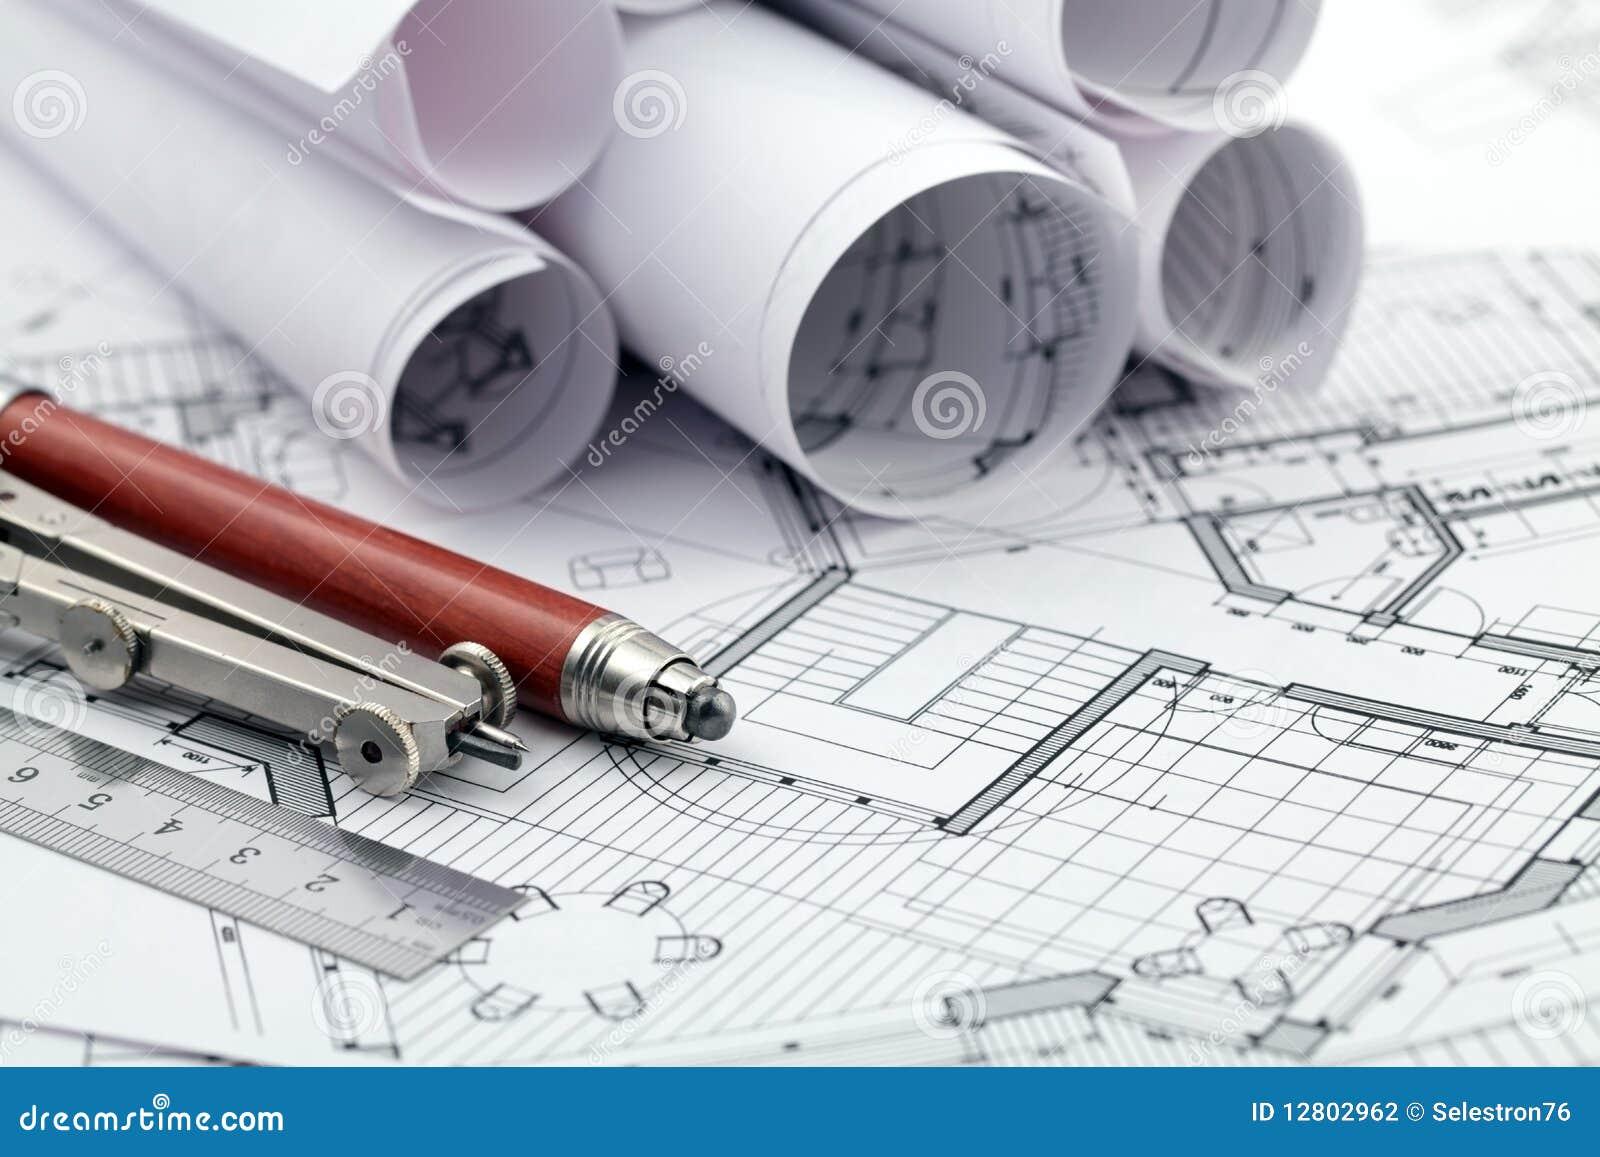 plan et outils d 39 architecture photographie stock image 12802962. Black Bedroom Furniture Sets. Home Design Ideas